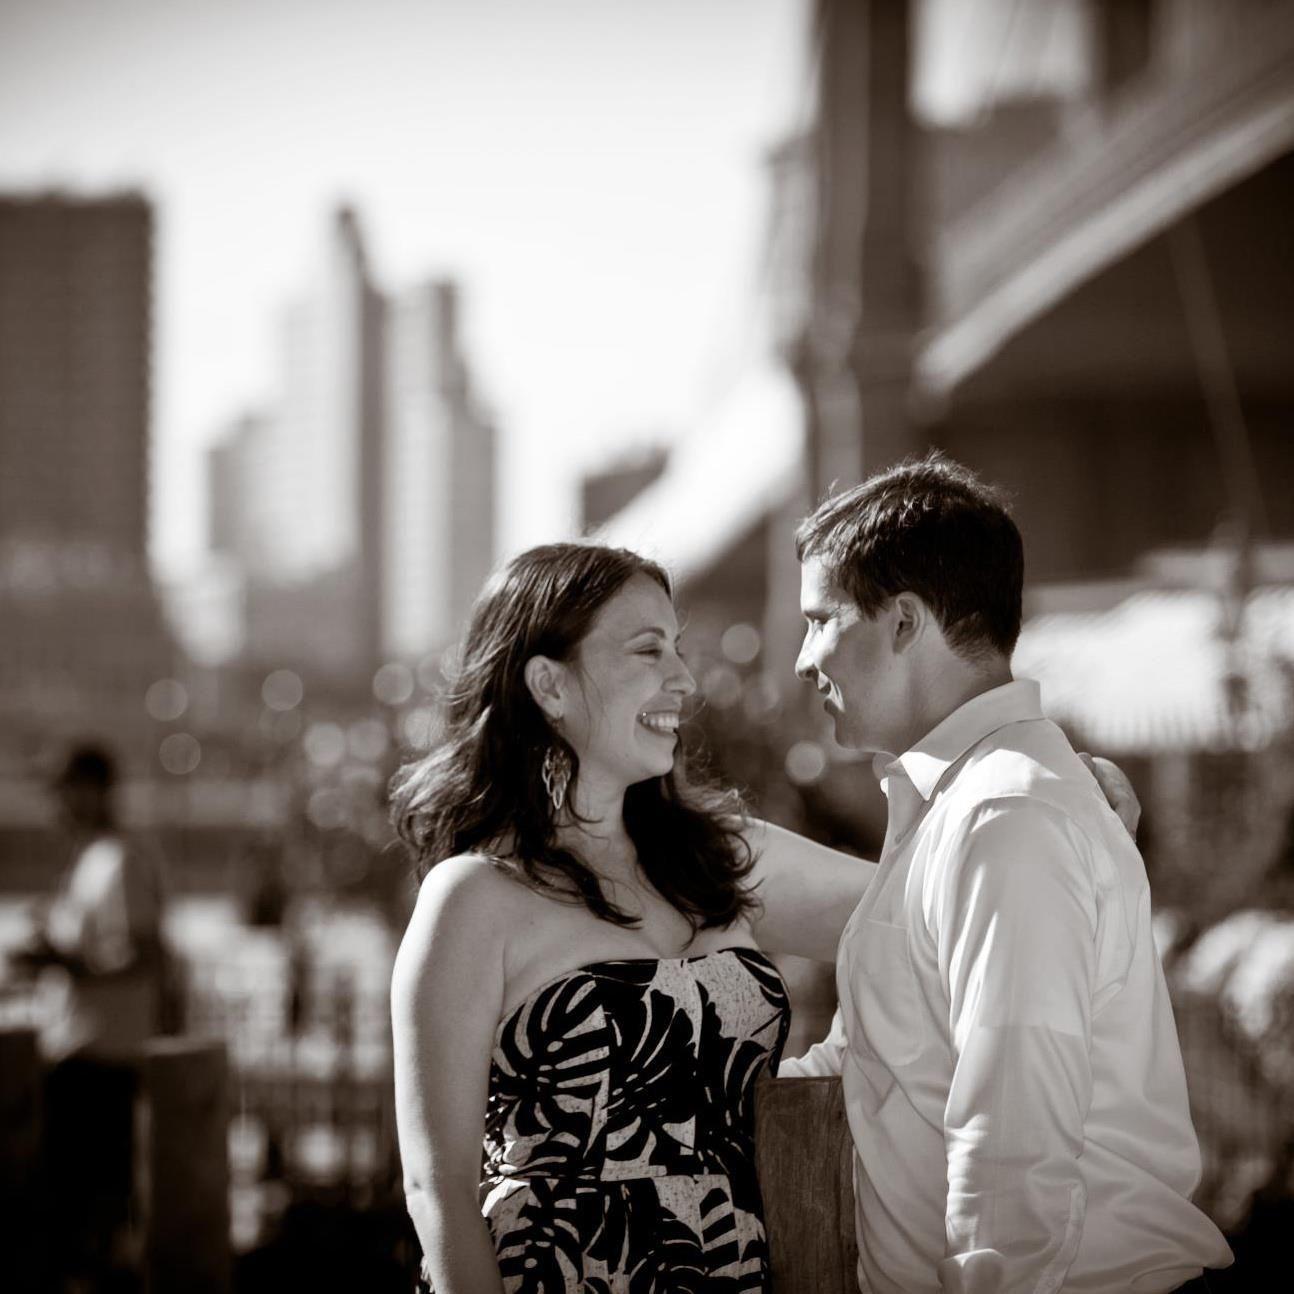 Tri steden dating beste aansluiting liedjes 2013